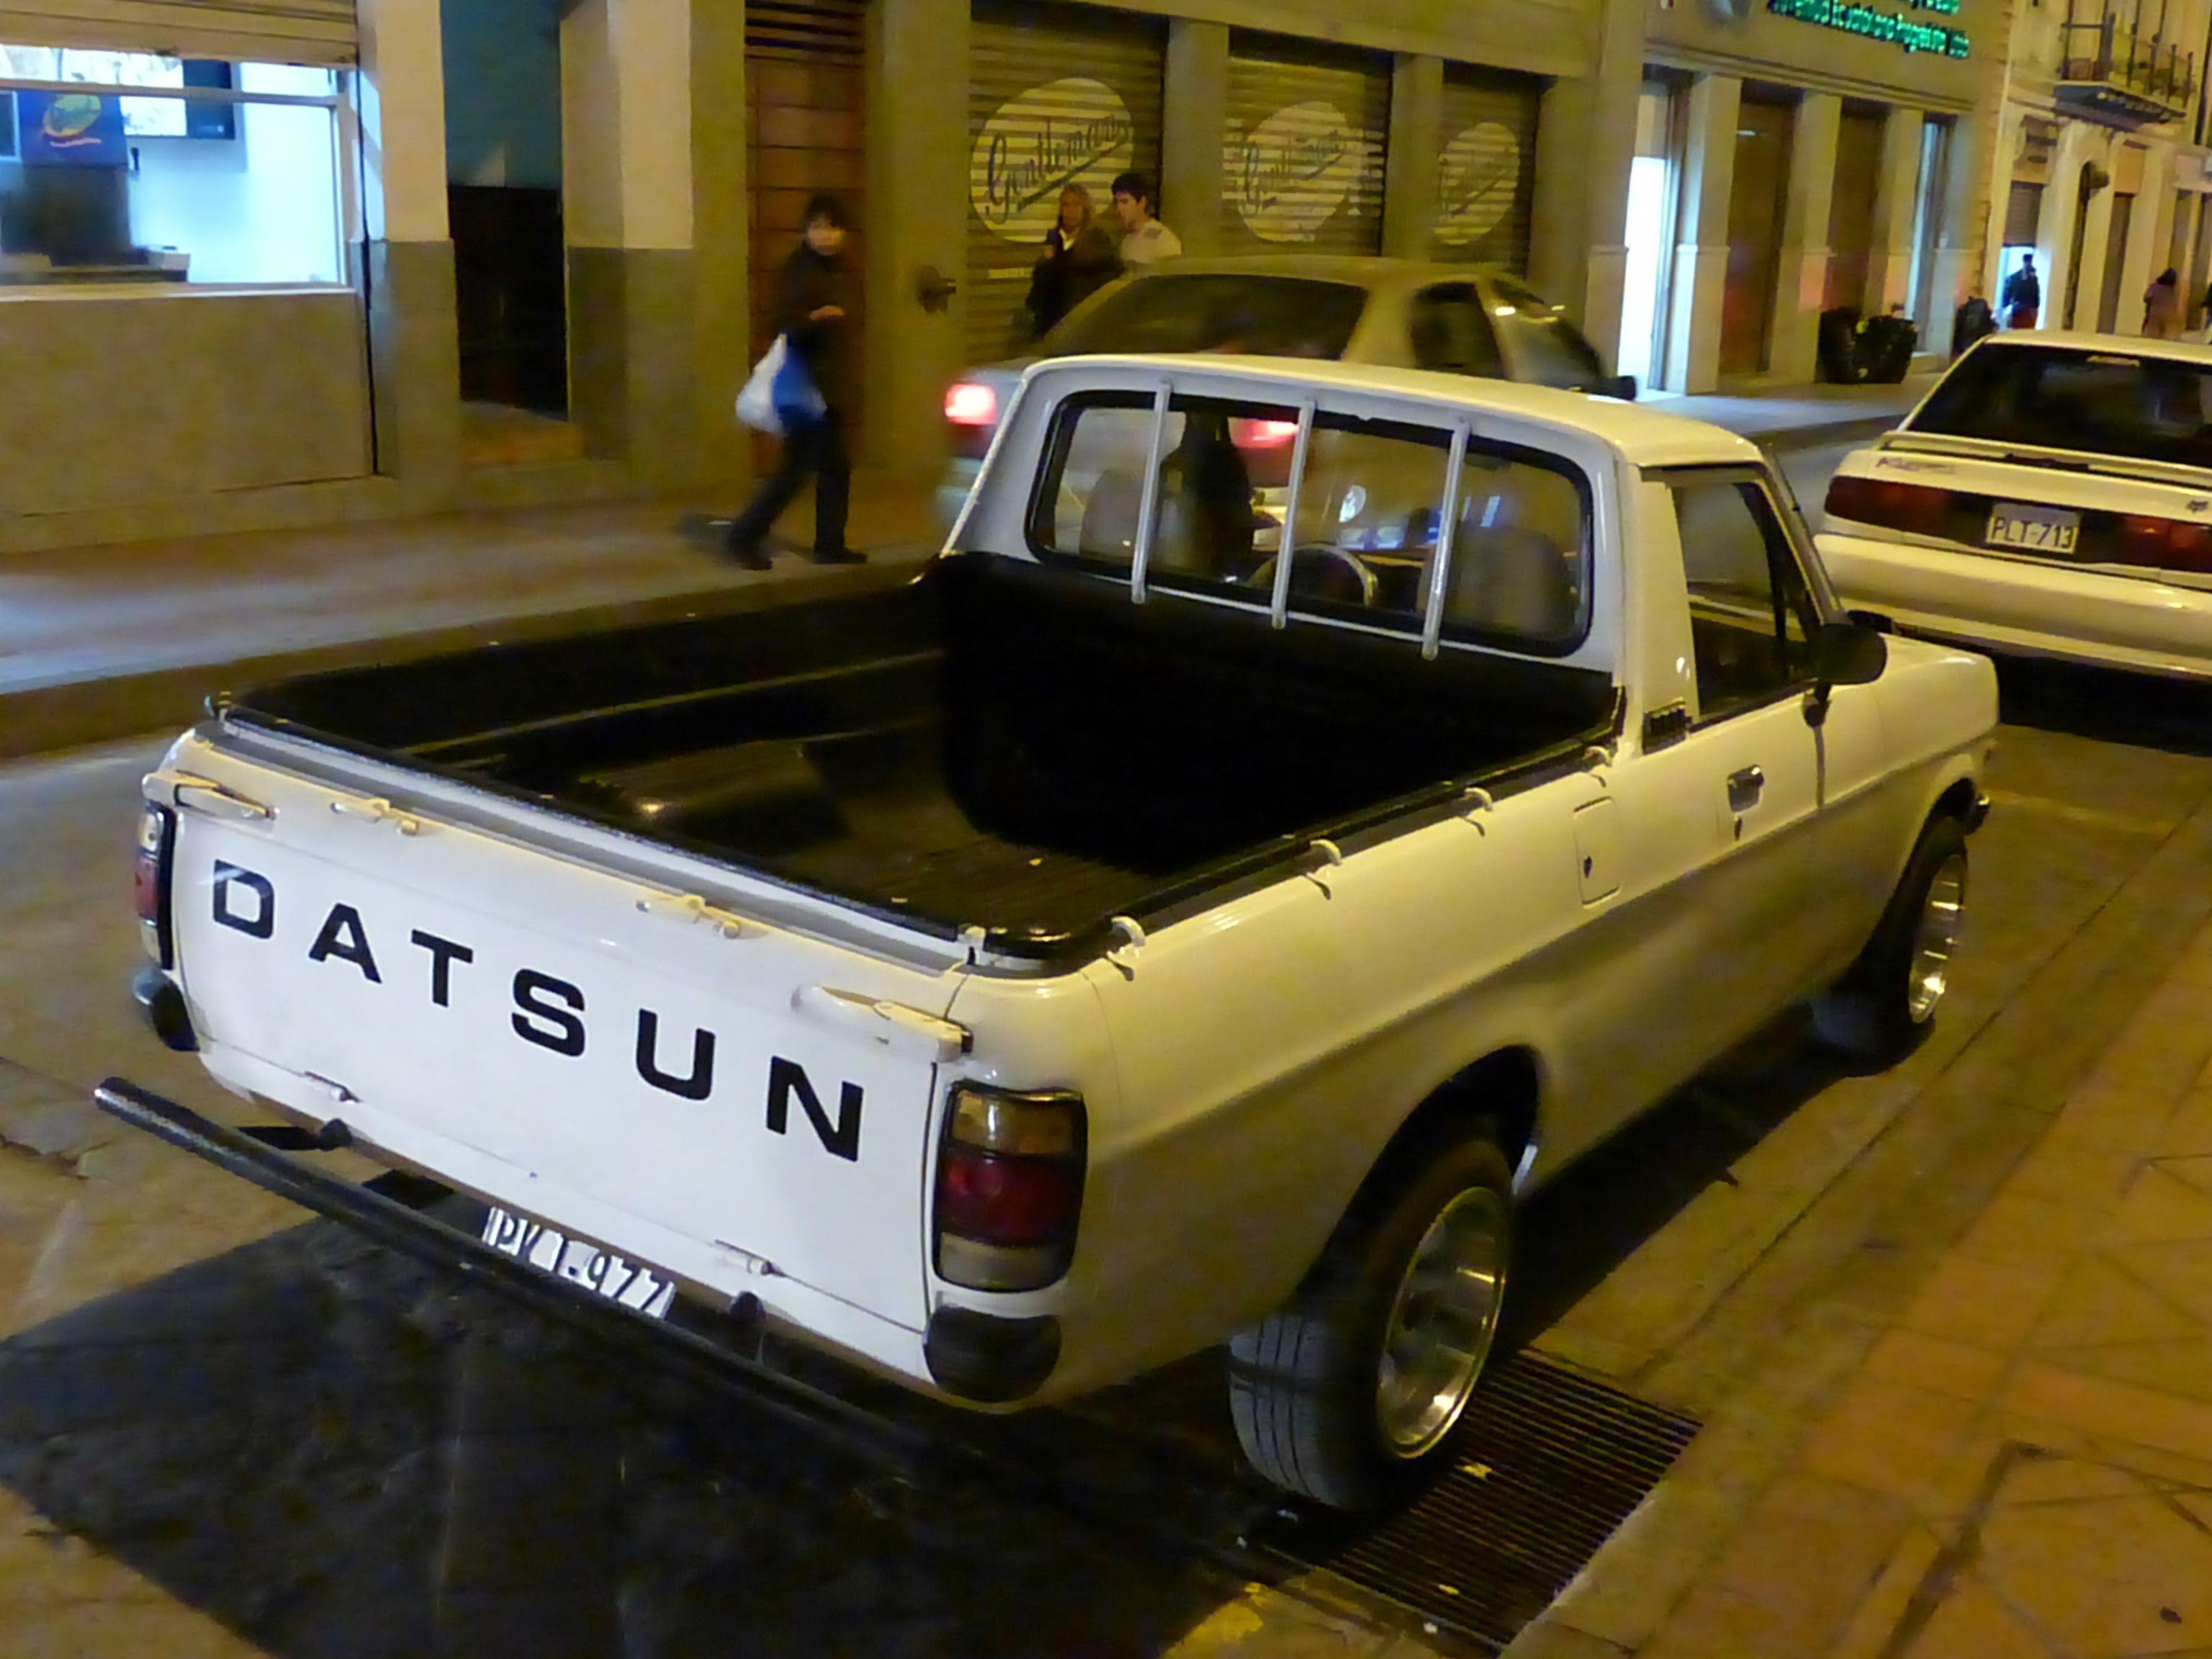 Datsun Pickup Cuanca Ecuador Datsun Pickup Datsun Nissan